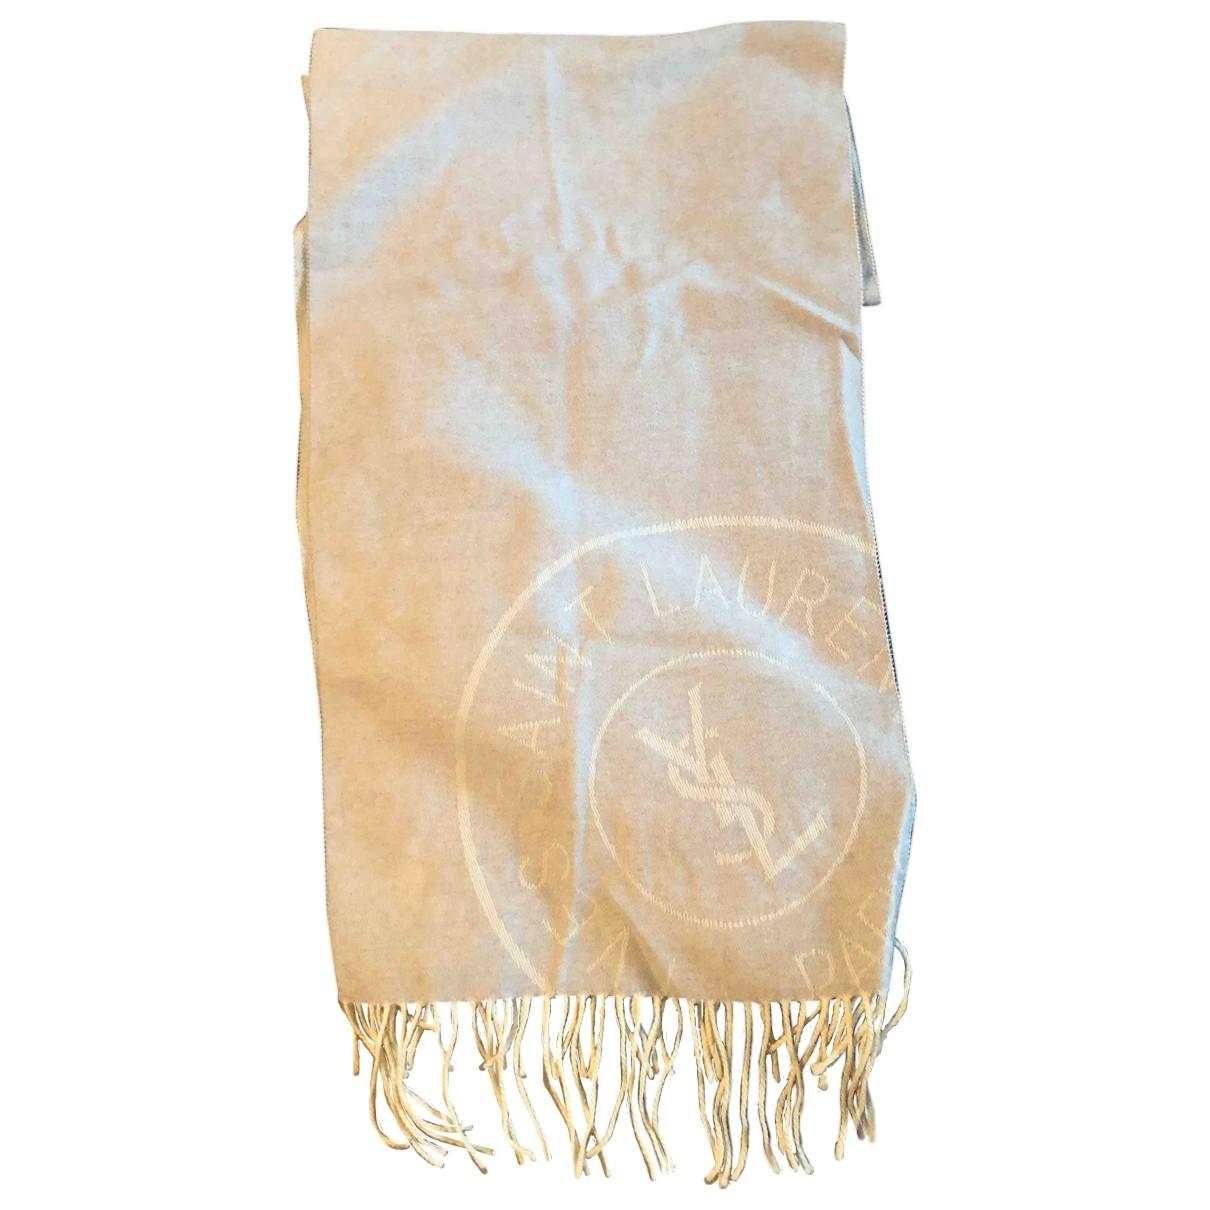 Yves Saint Laurent \N Grey Cashmere scarf for Women \N